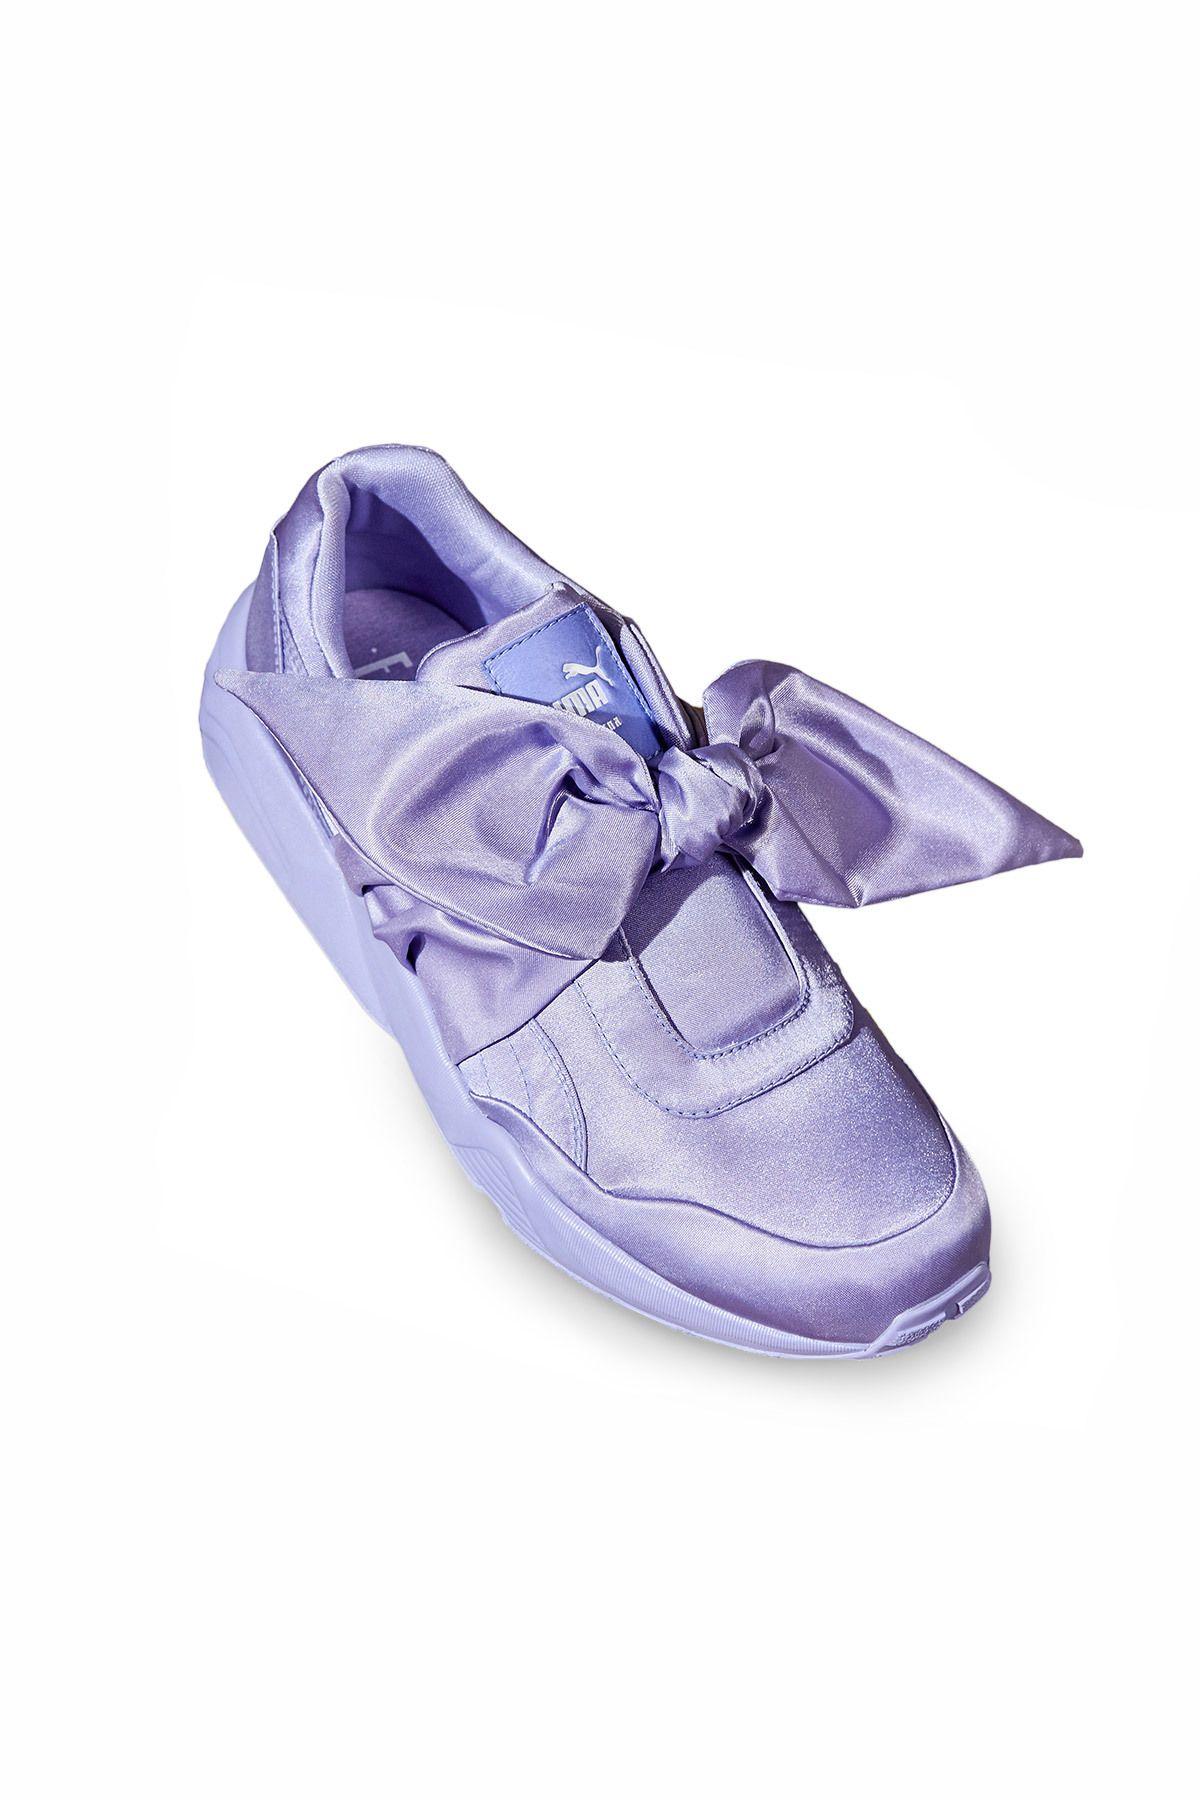 best sneakers 1639e 74797 FENTY PUMA by Rihanna, Bow Sneaker FENTY PUMA by Rihanna's ...